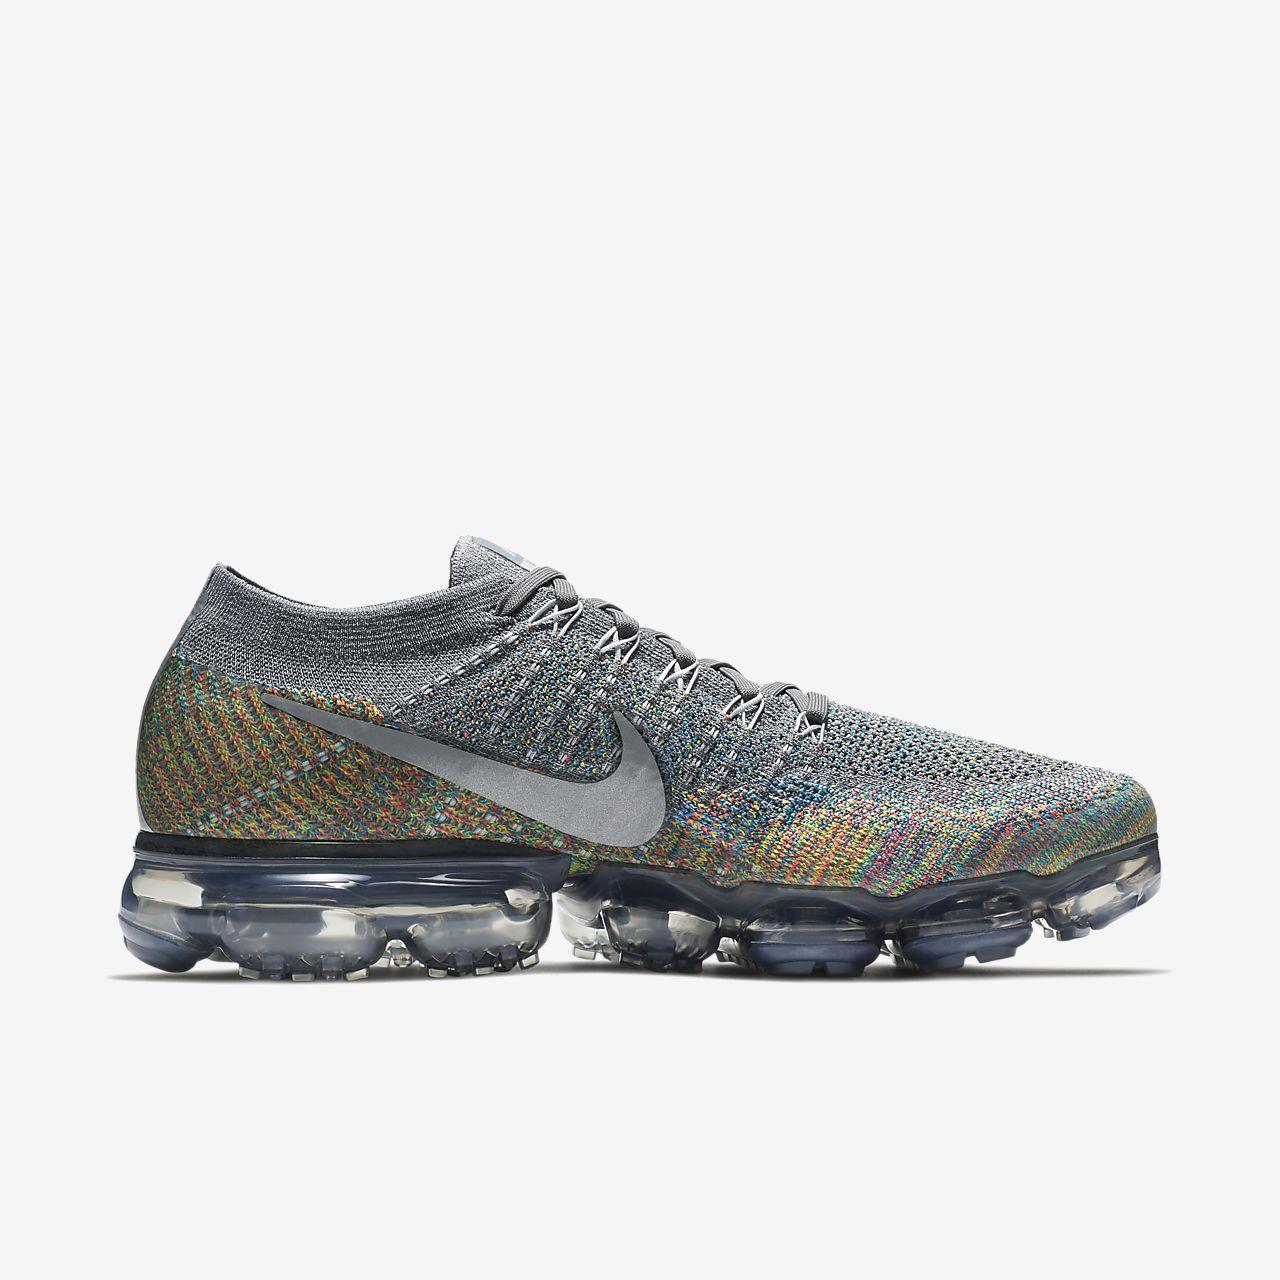 6a1615d10eb0 Nike Air VaporMax Flyknit Men s Shoe. Nike.com DK